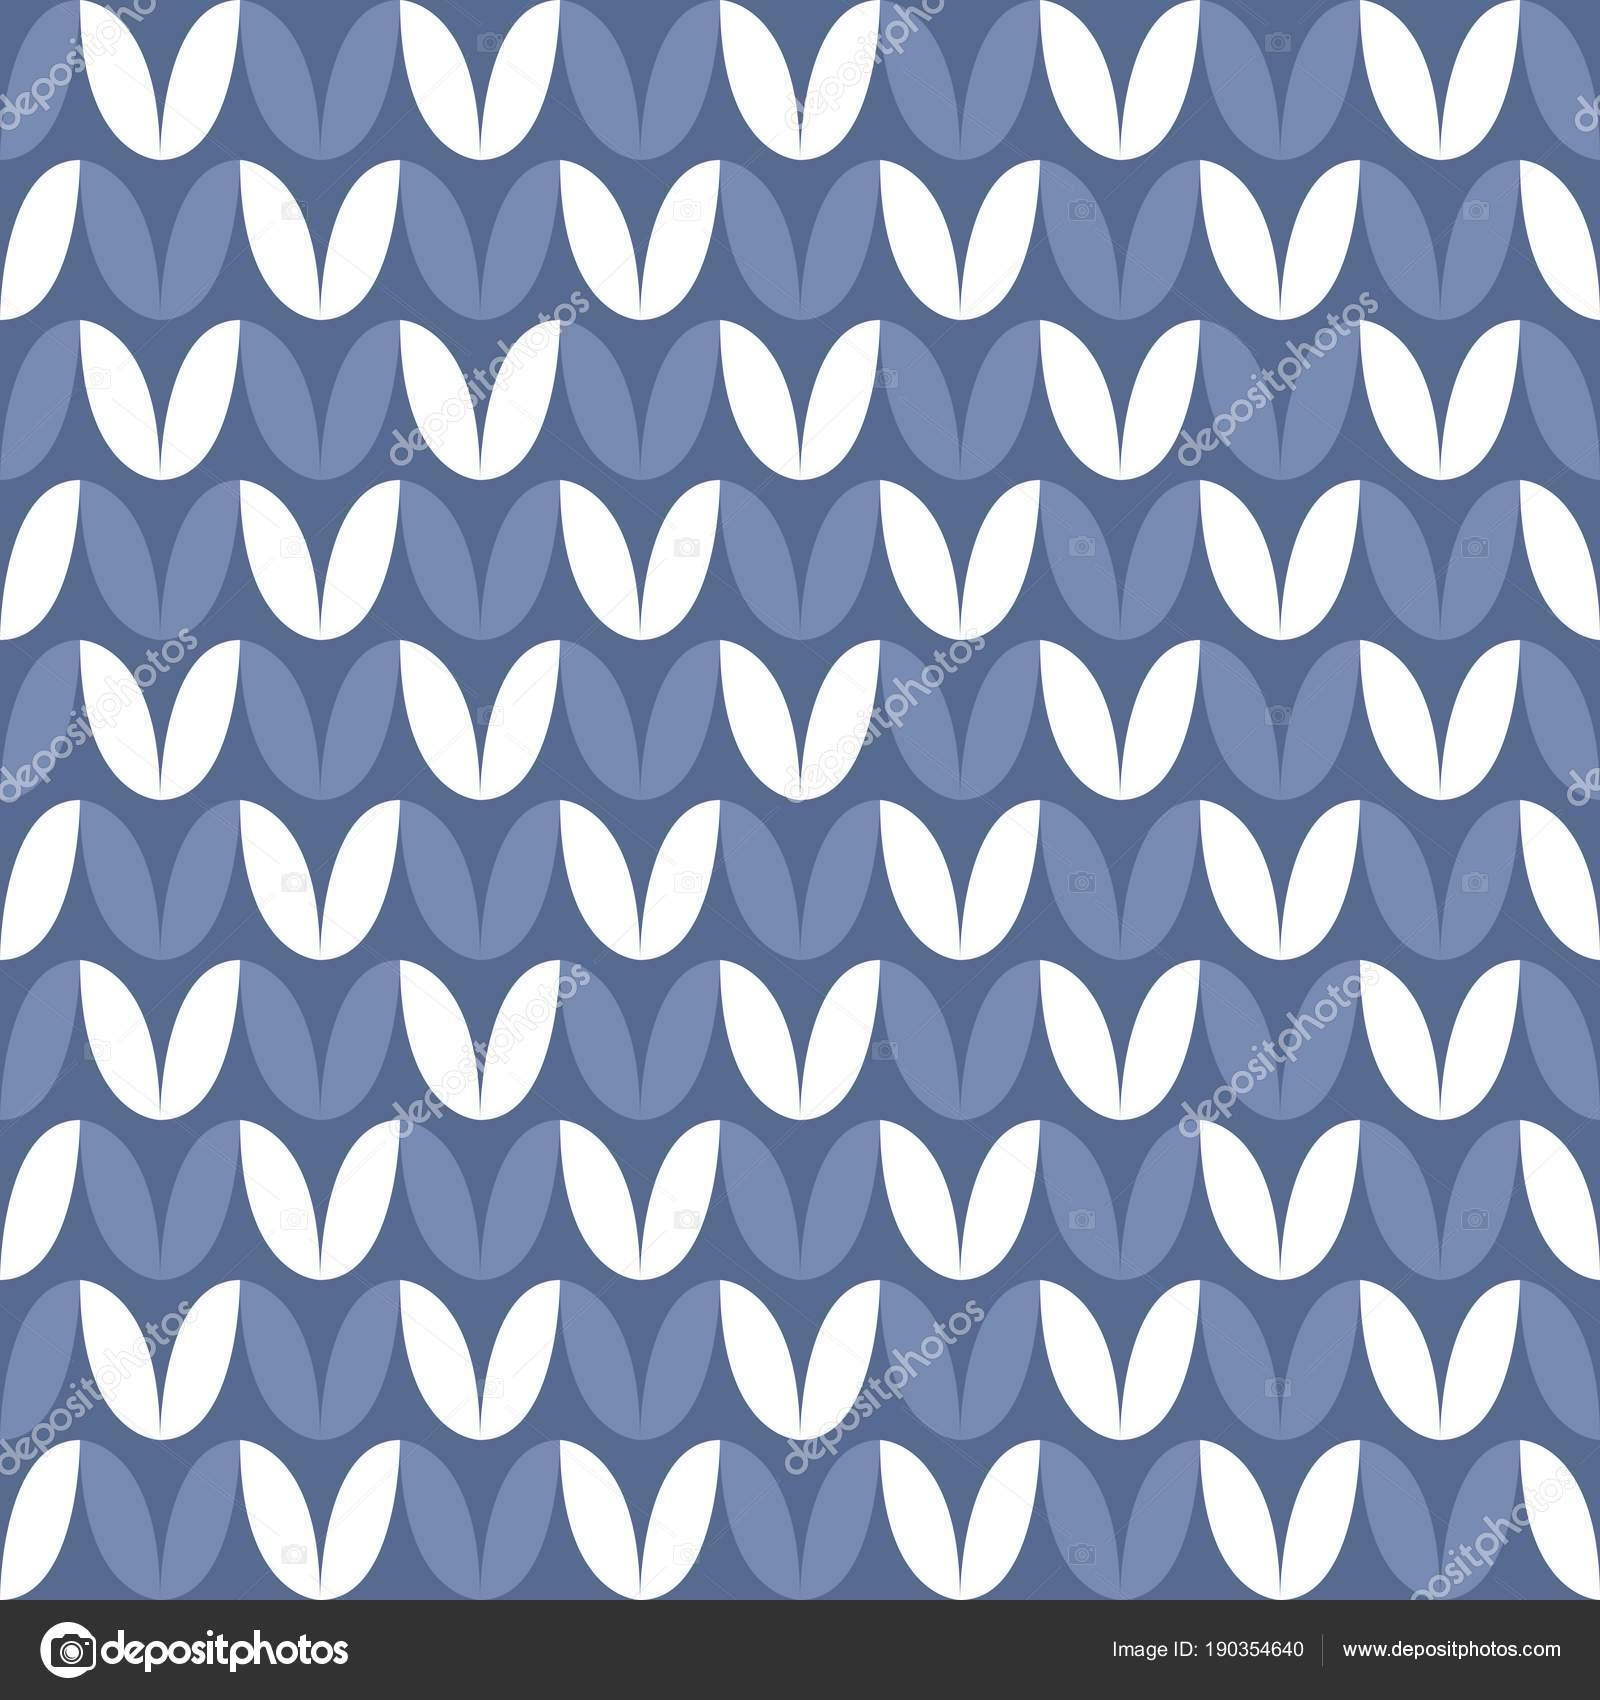 Carrelage Bleu Blanc Tricot Vector Pattern Hiver Fond Image - Carrelage bleu